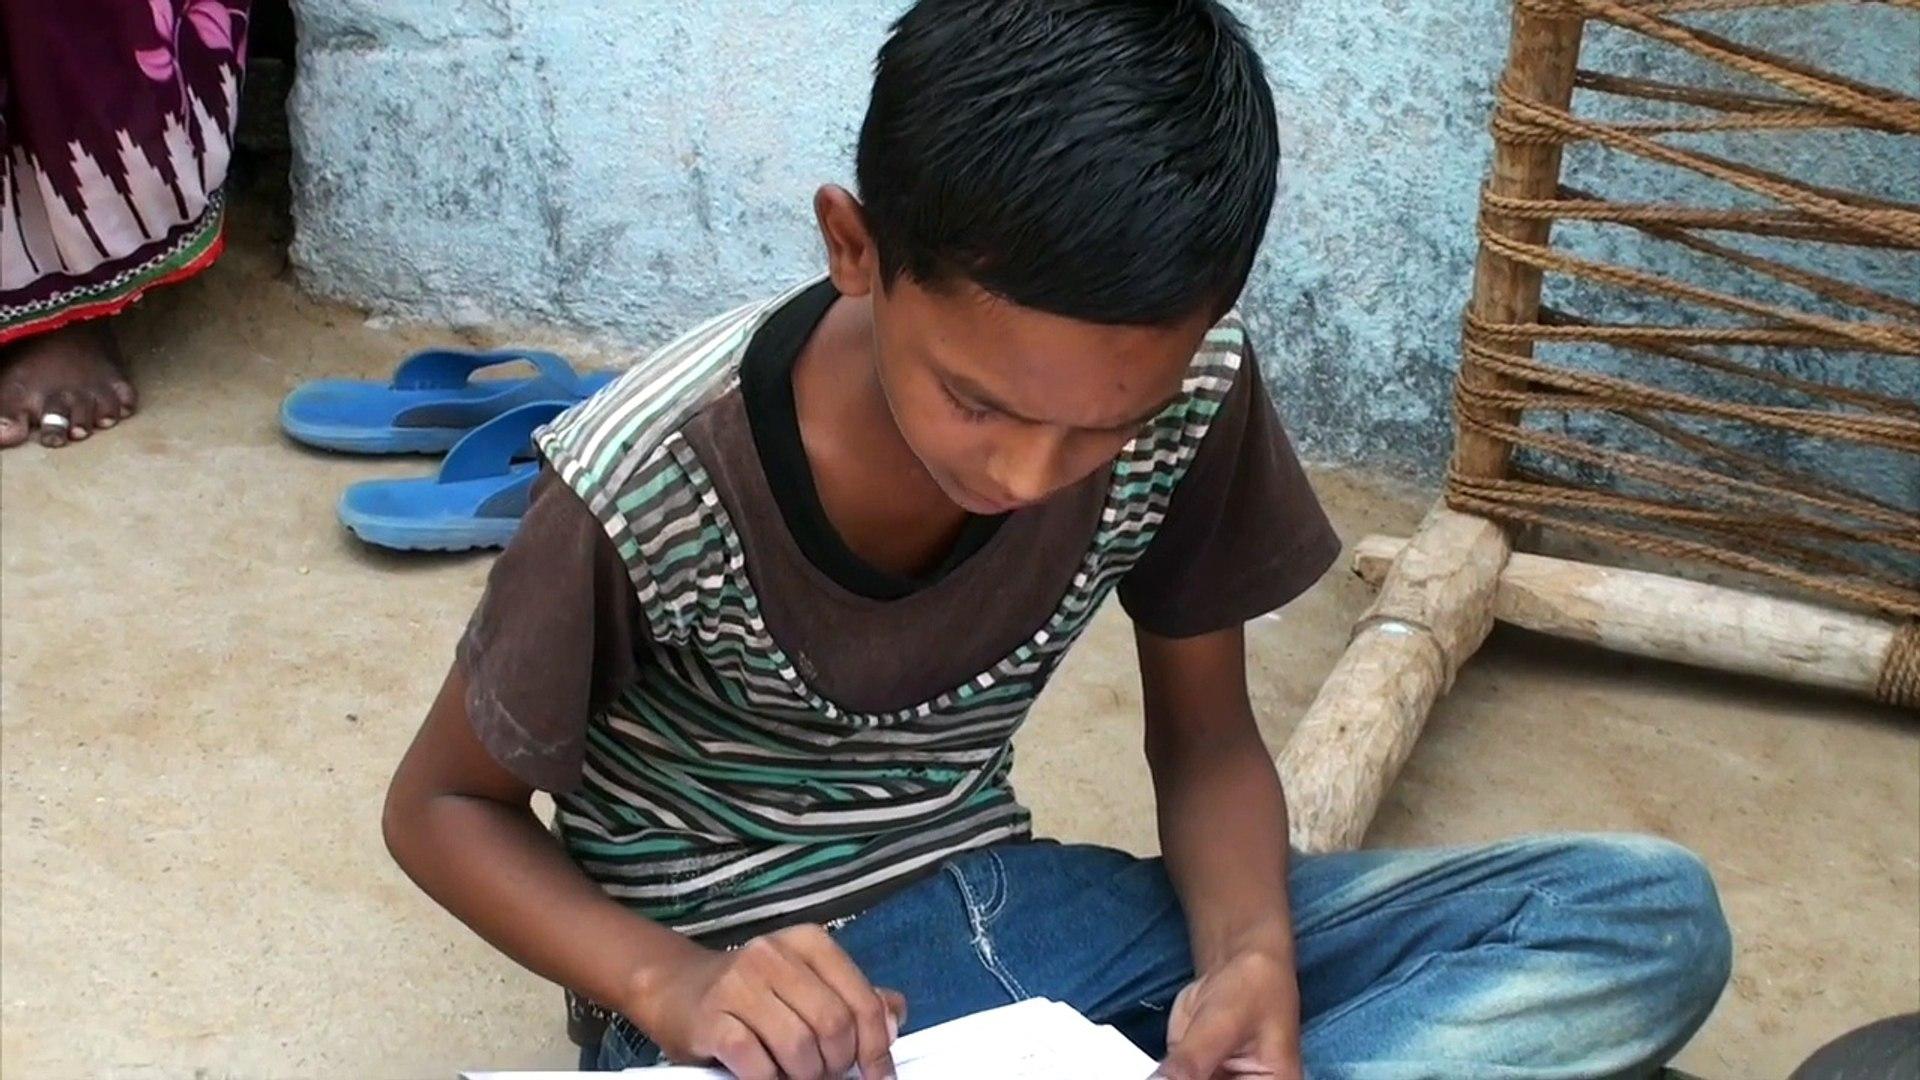 ASER Survey in Action in Aurangabad, India - Part 2